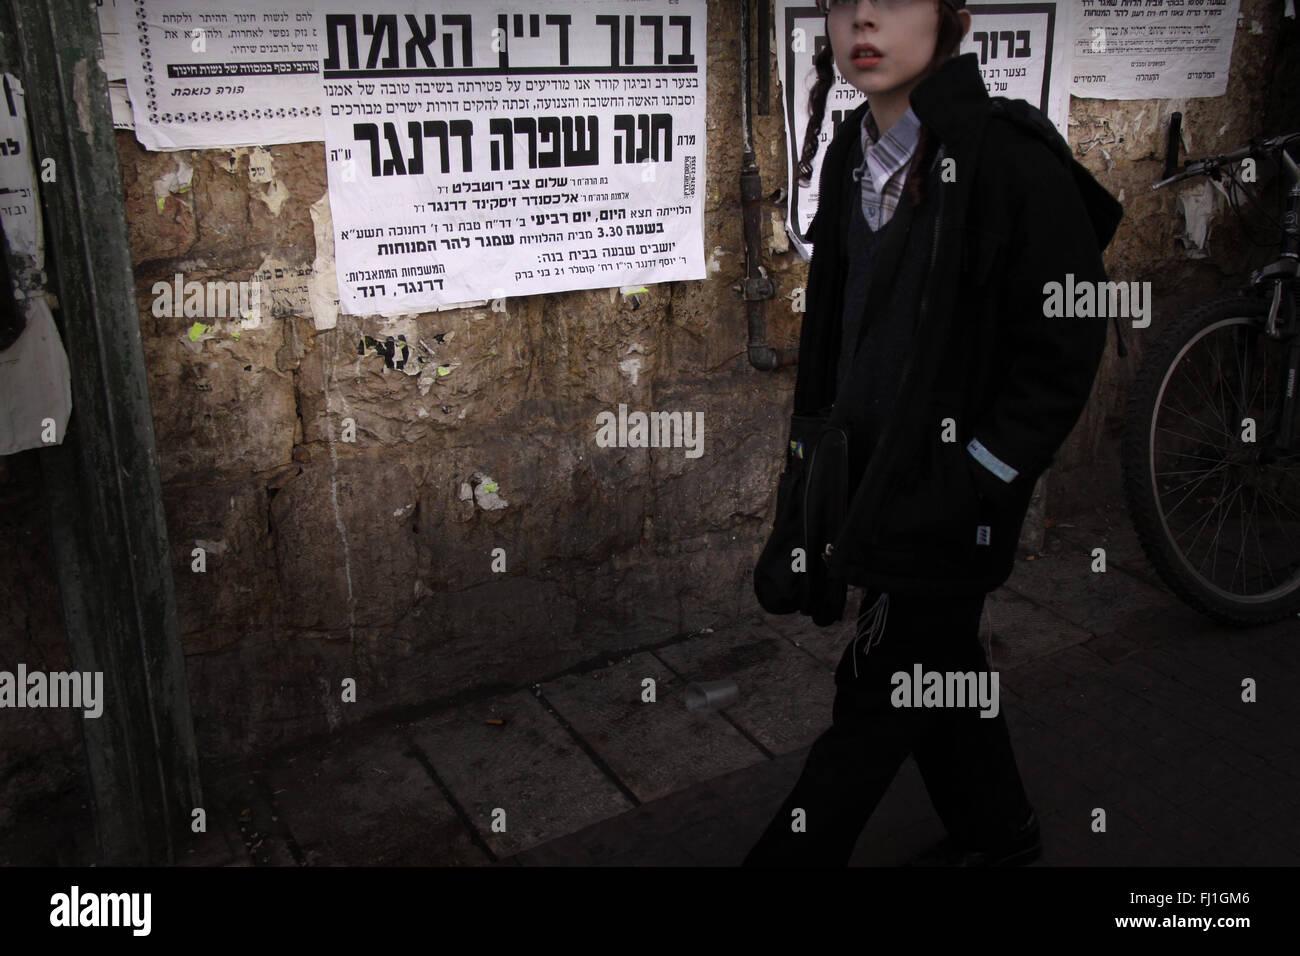 15e8775ced Ultra Orthdox Jewish people in Mea Shearim neighborhood in Jerusalem ,  Israel - Stock Image